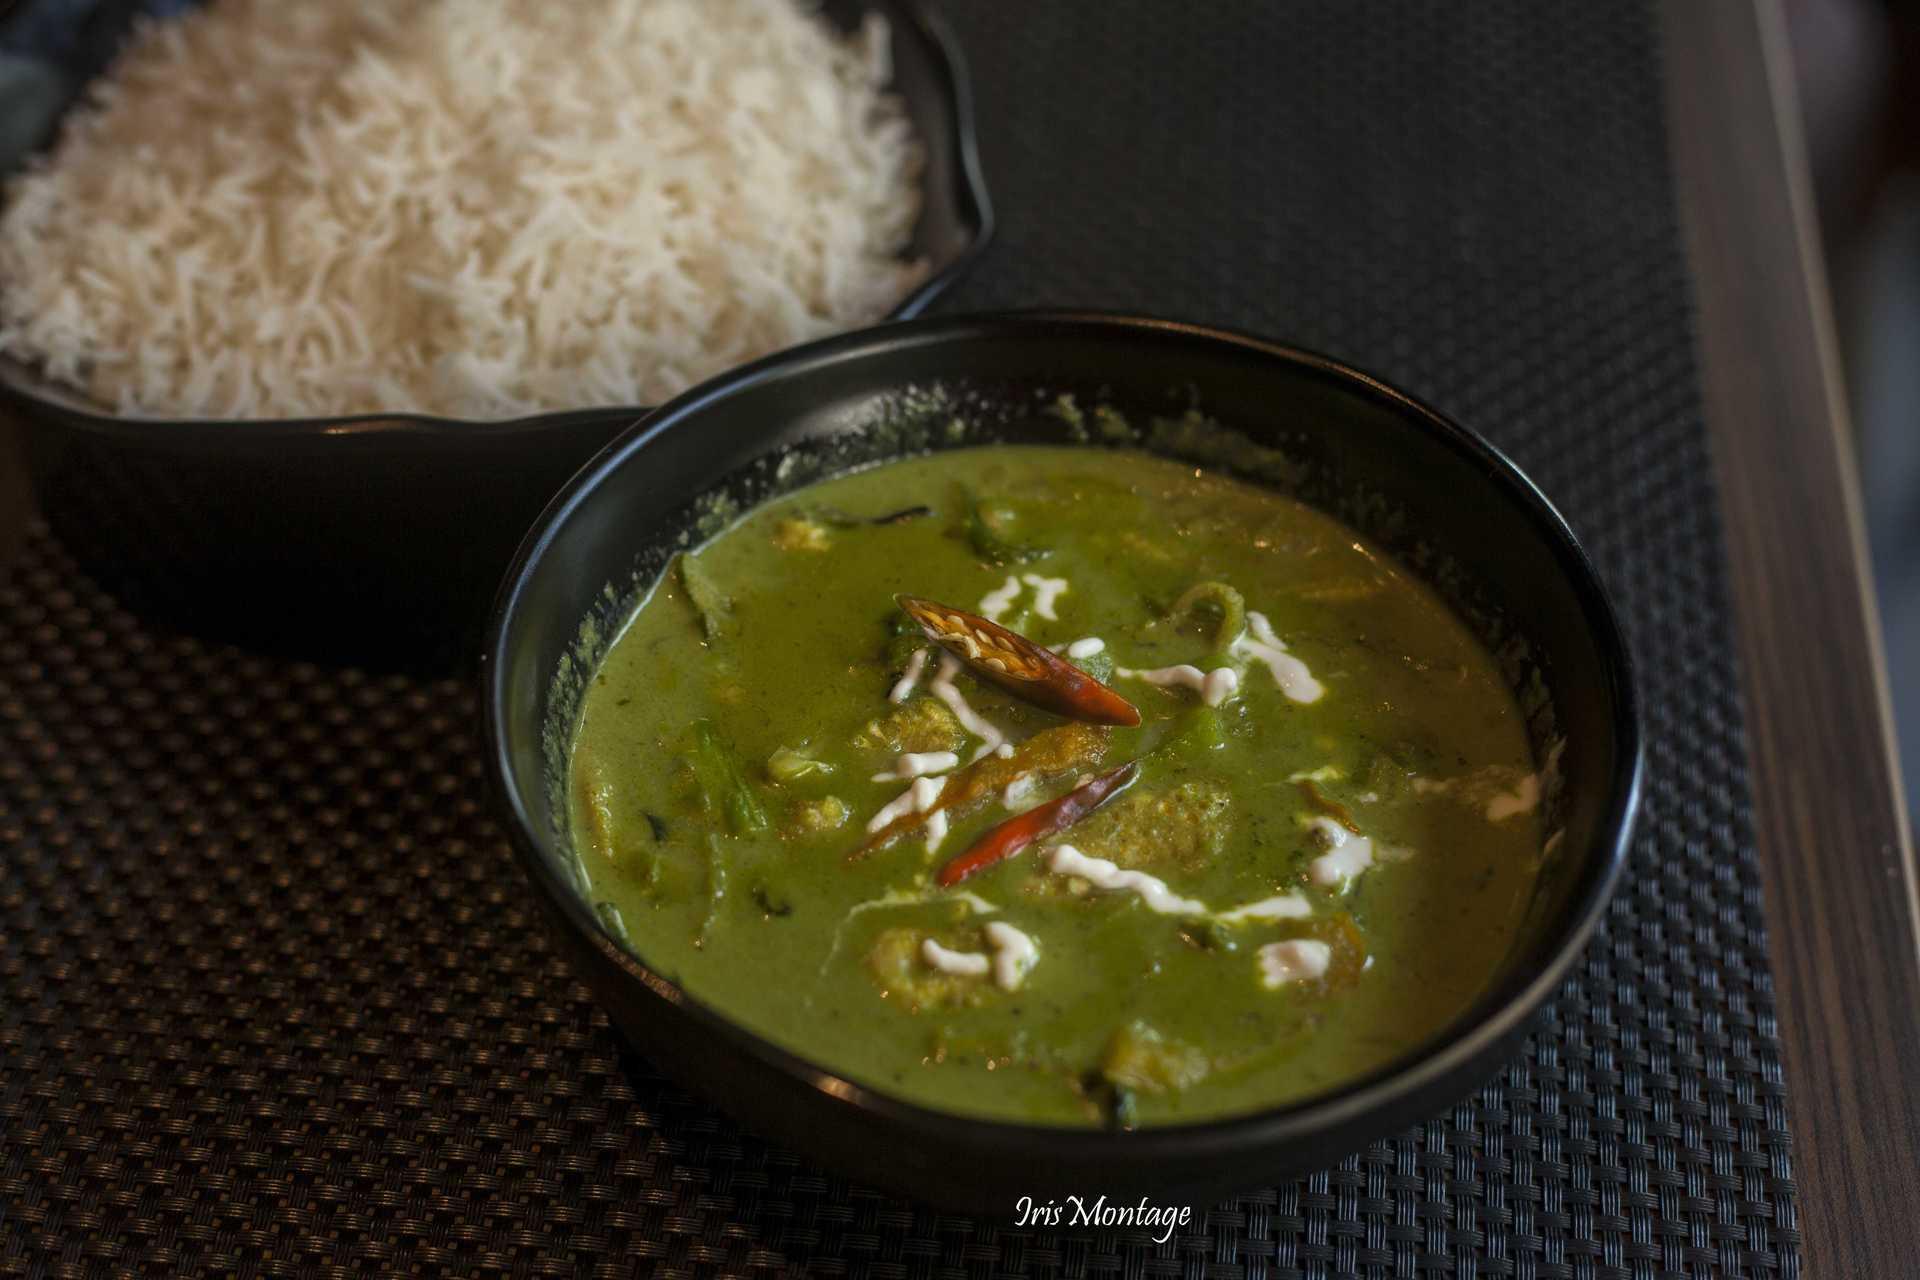 IrisMontage - Thai cuisine pure vegetarian_chennai restaurant